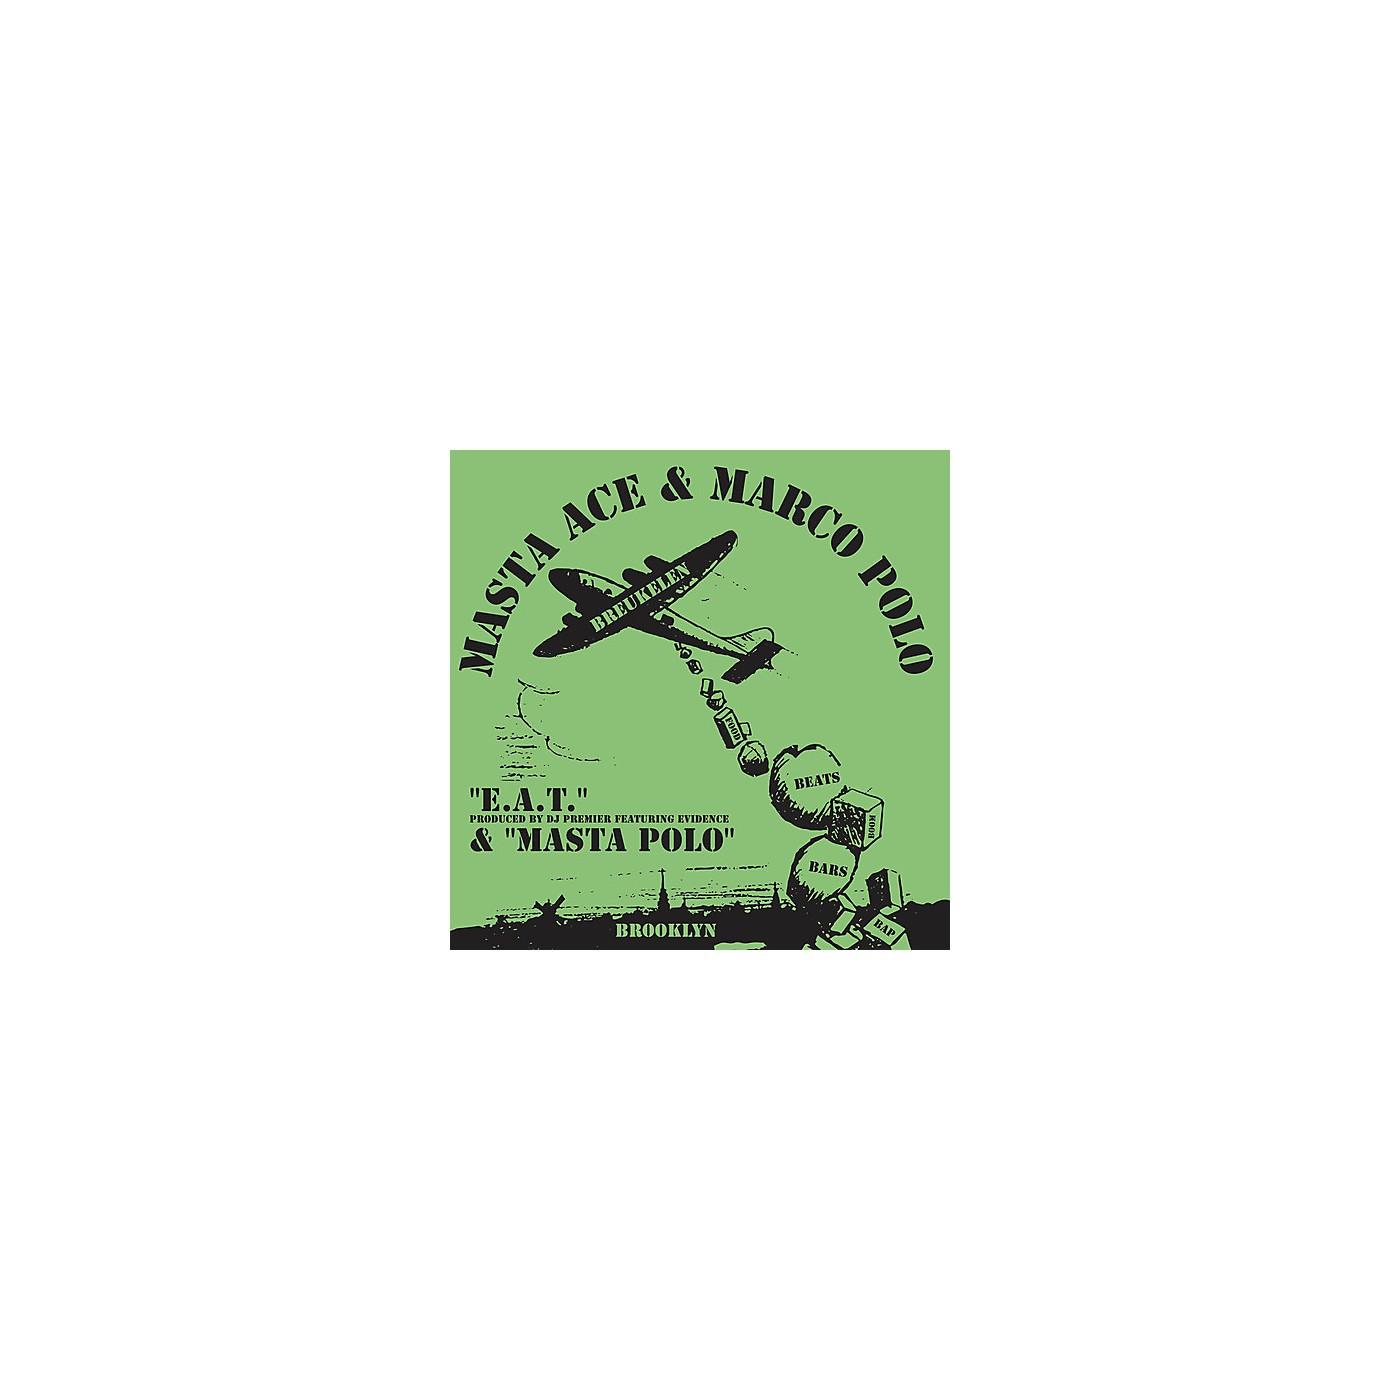 Alliance Masta Ace & Marco Polo - E.A.T. feat. Evidence and produced by DJ Premier b/w Masta Polo thumbnail